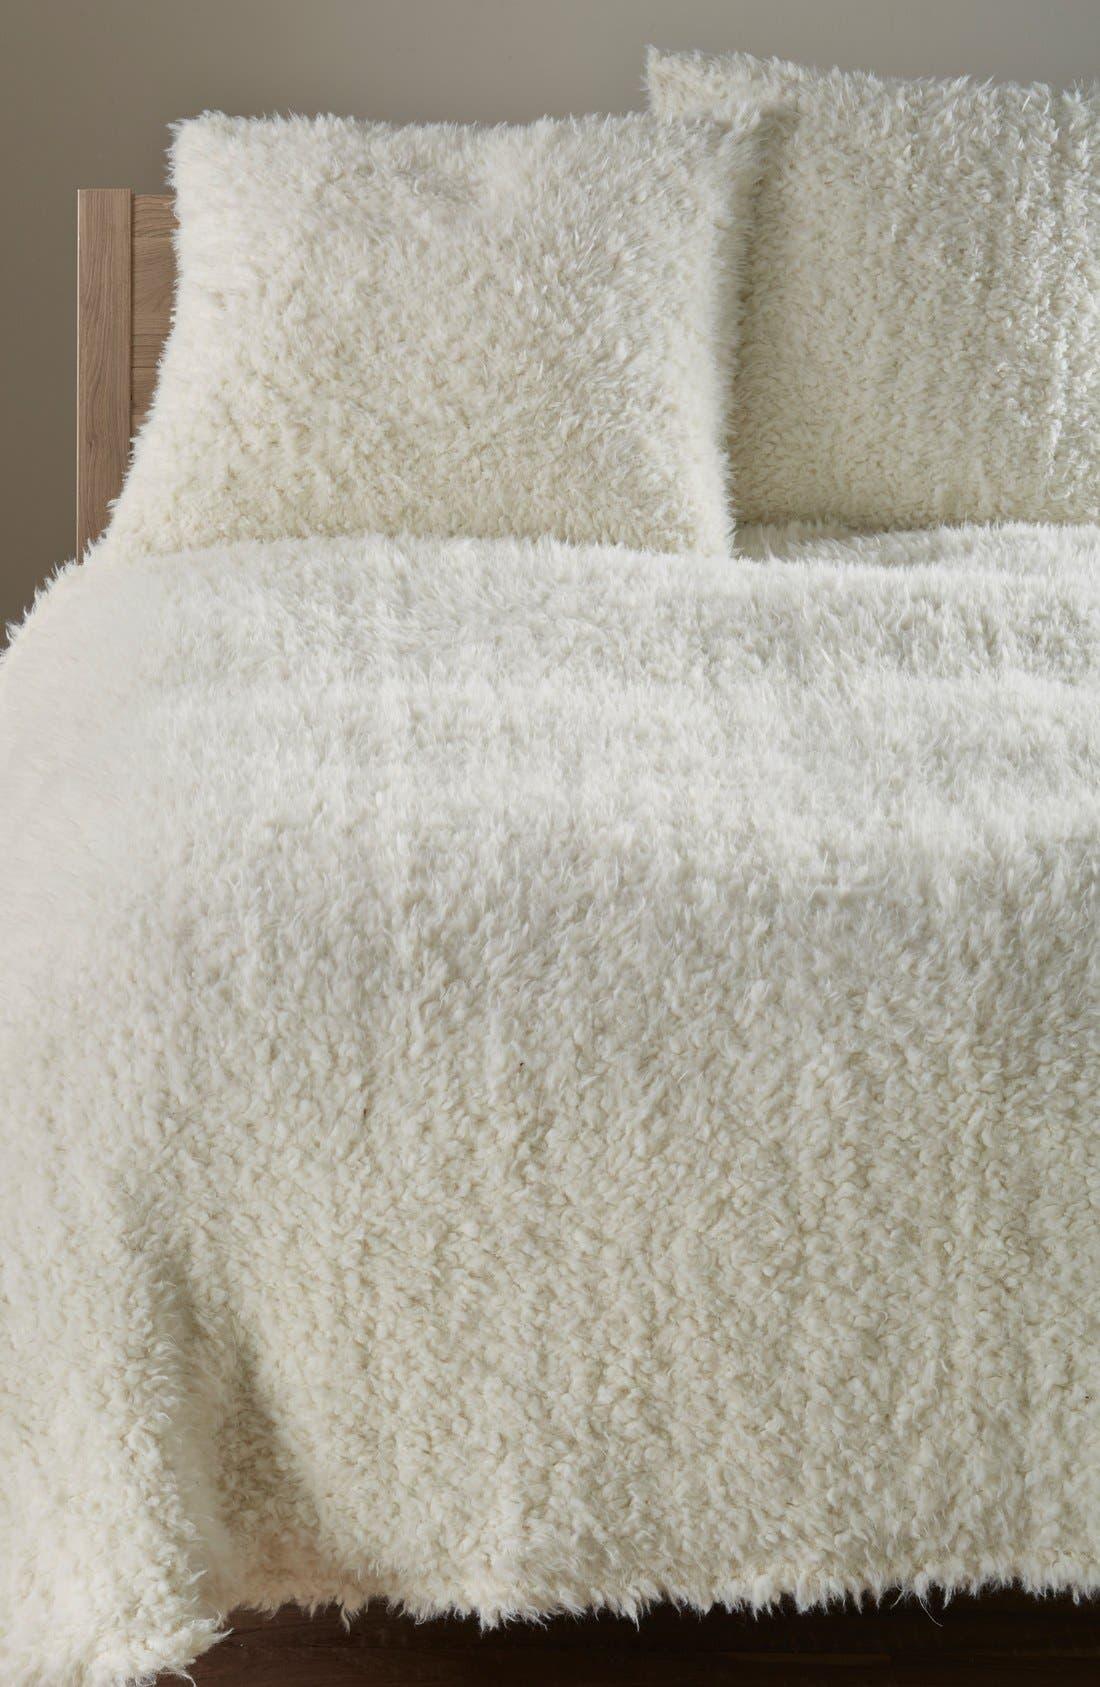 'Shaggy Plush' Faux Fur Blanket,                             Alternate thumbnail 2, color,                             900